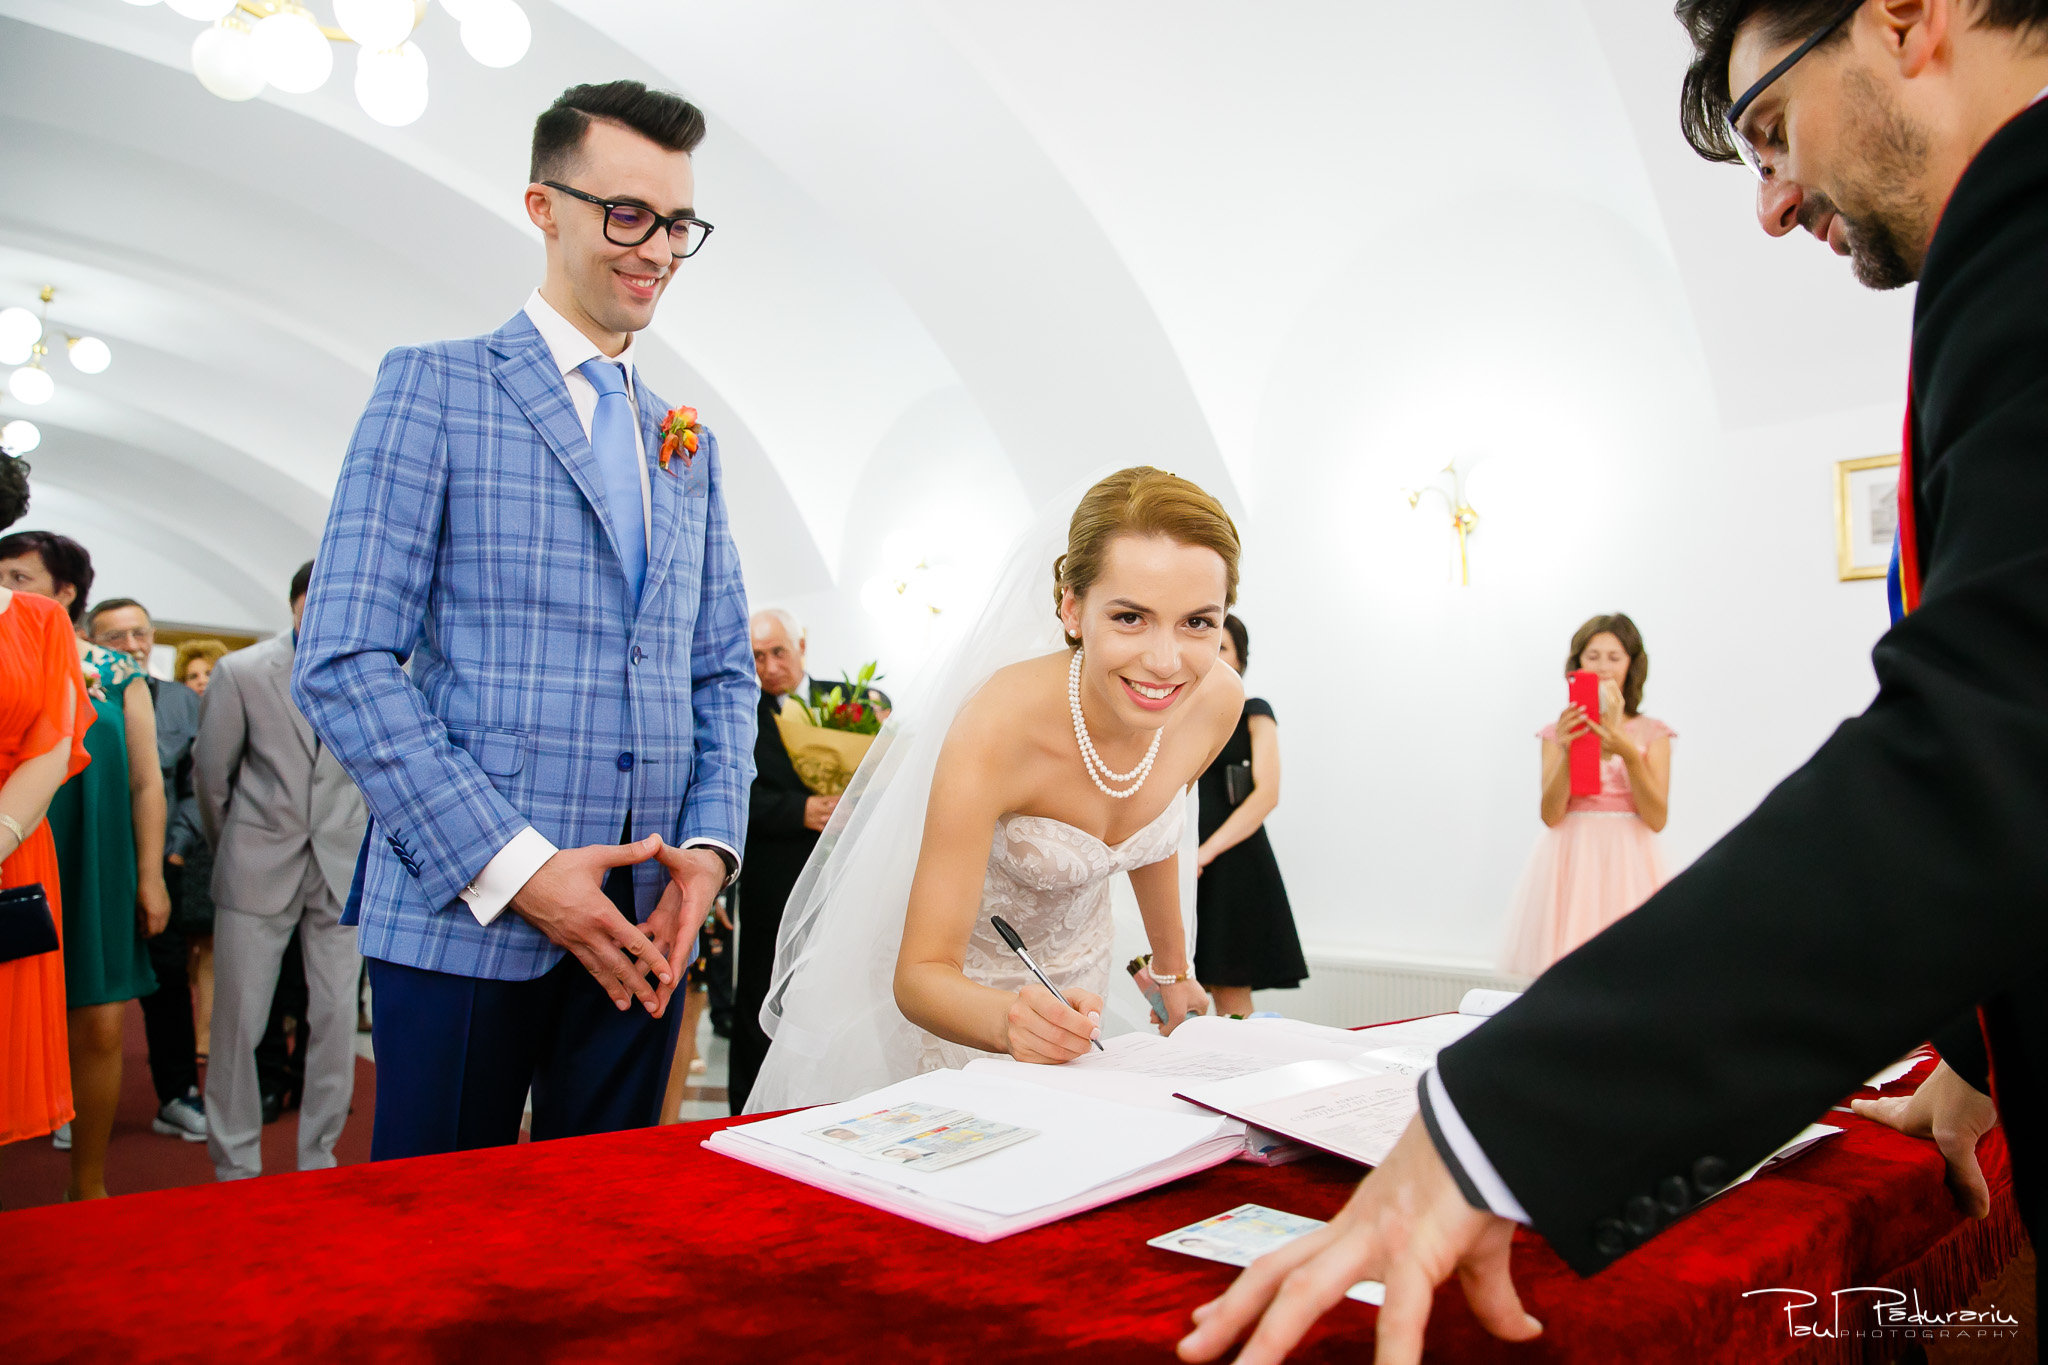 Roxana si Silviu Nunta Hotel Eden Iasi - oficierea starii civile mireasa - fotograf profesionist nunta www.paulpadurariu.ro © 2017 Paul Padurariu